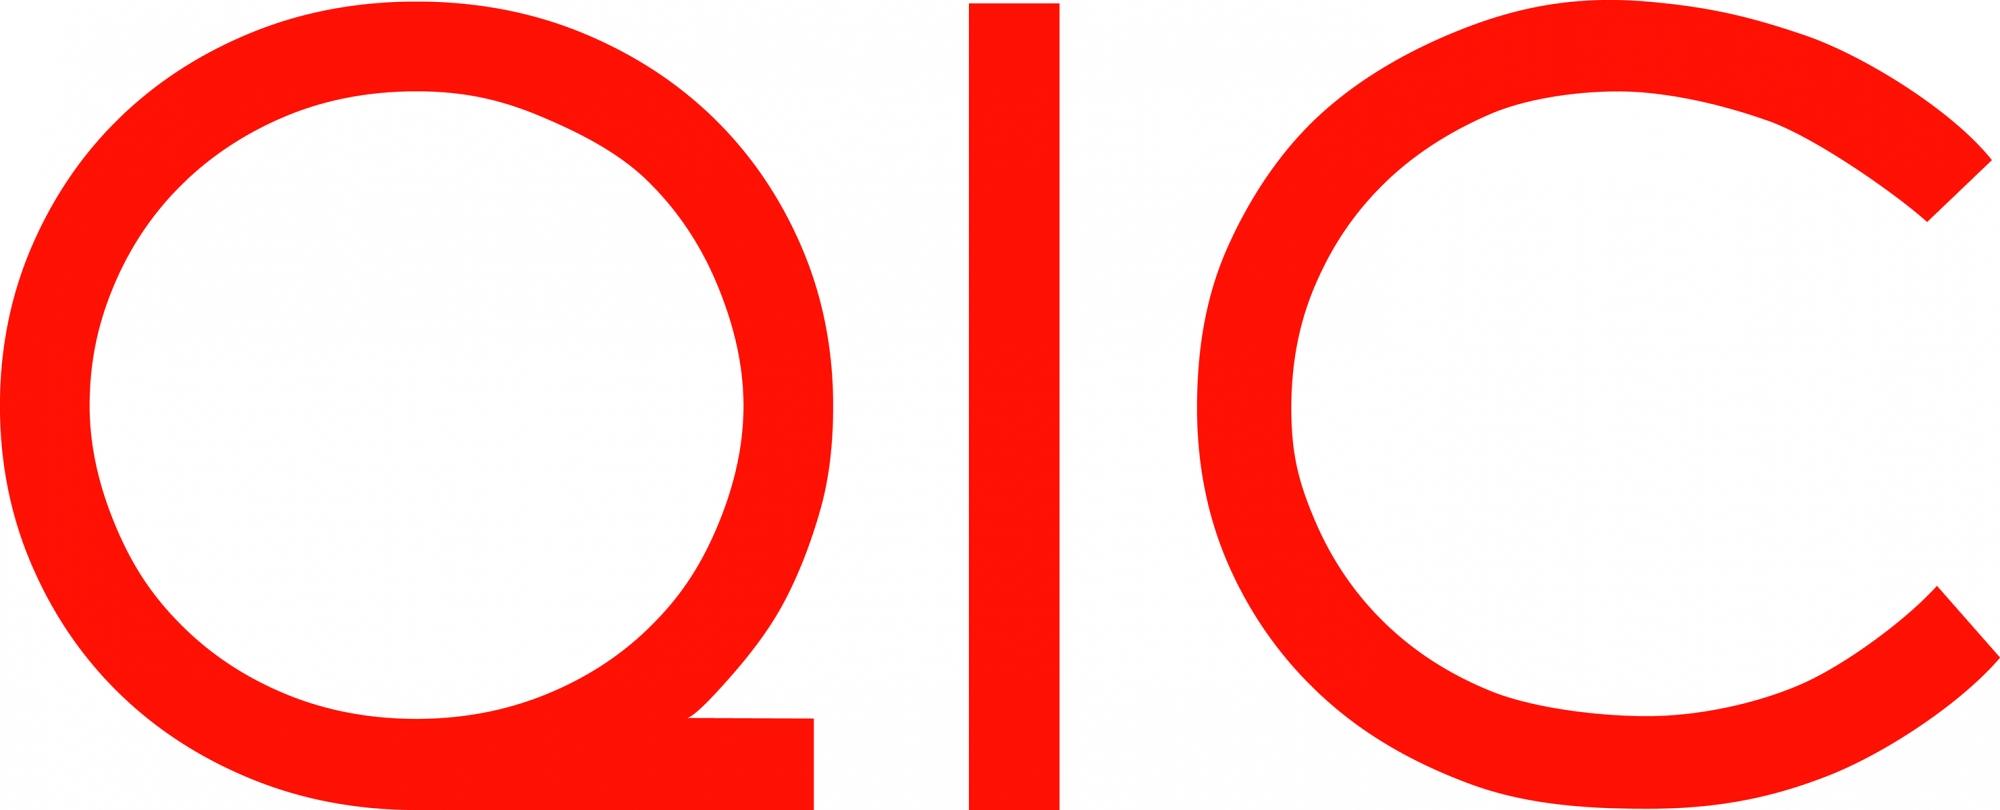 QIC Queensland Investment Corporation